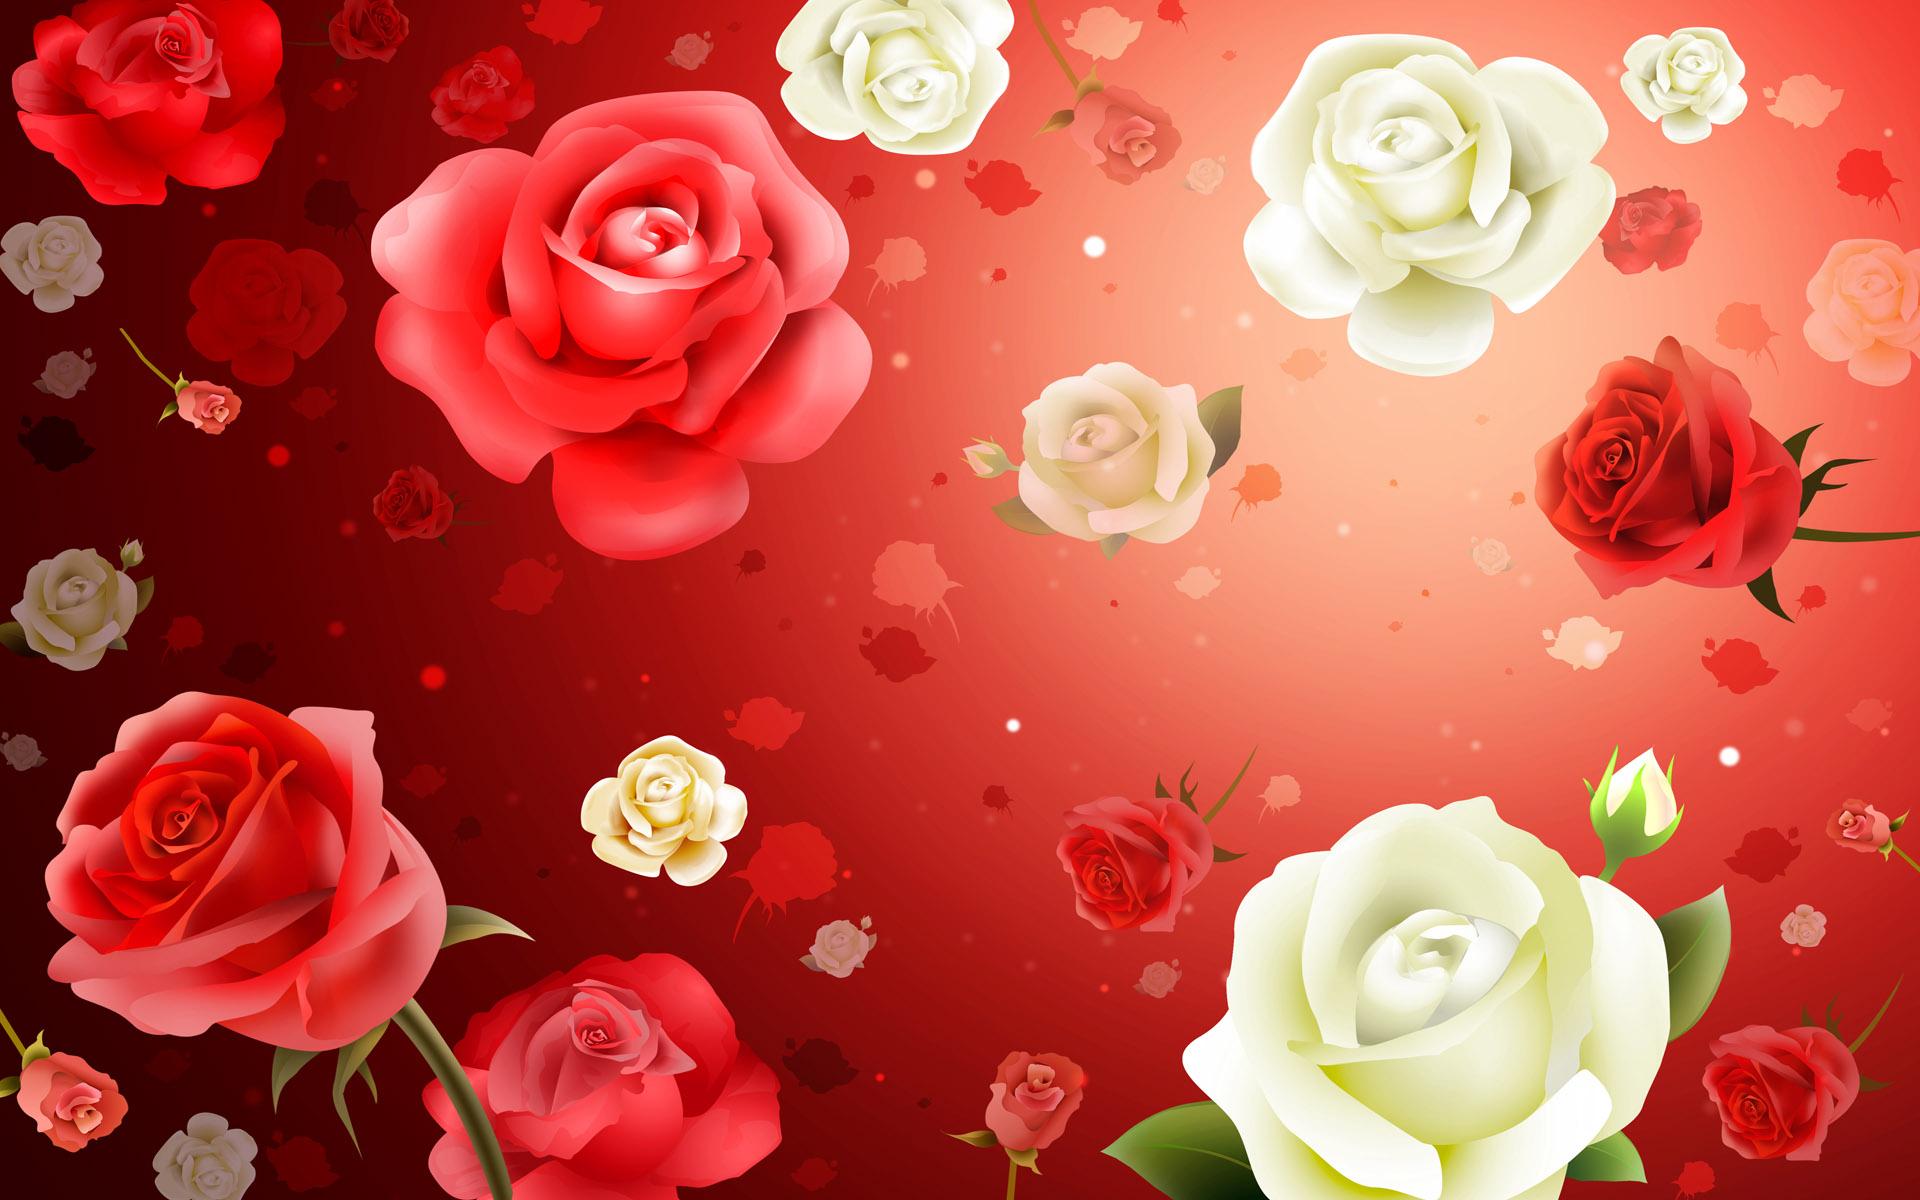 roses wallpapers wallpaper desktop 1920x1200 1920x1200